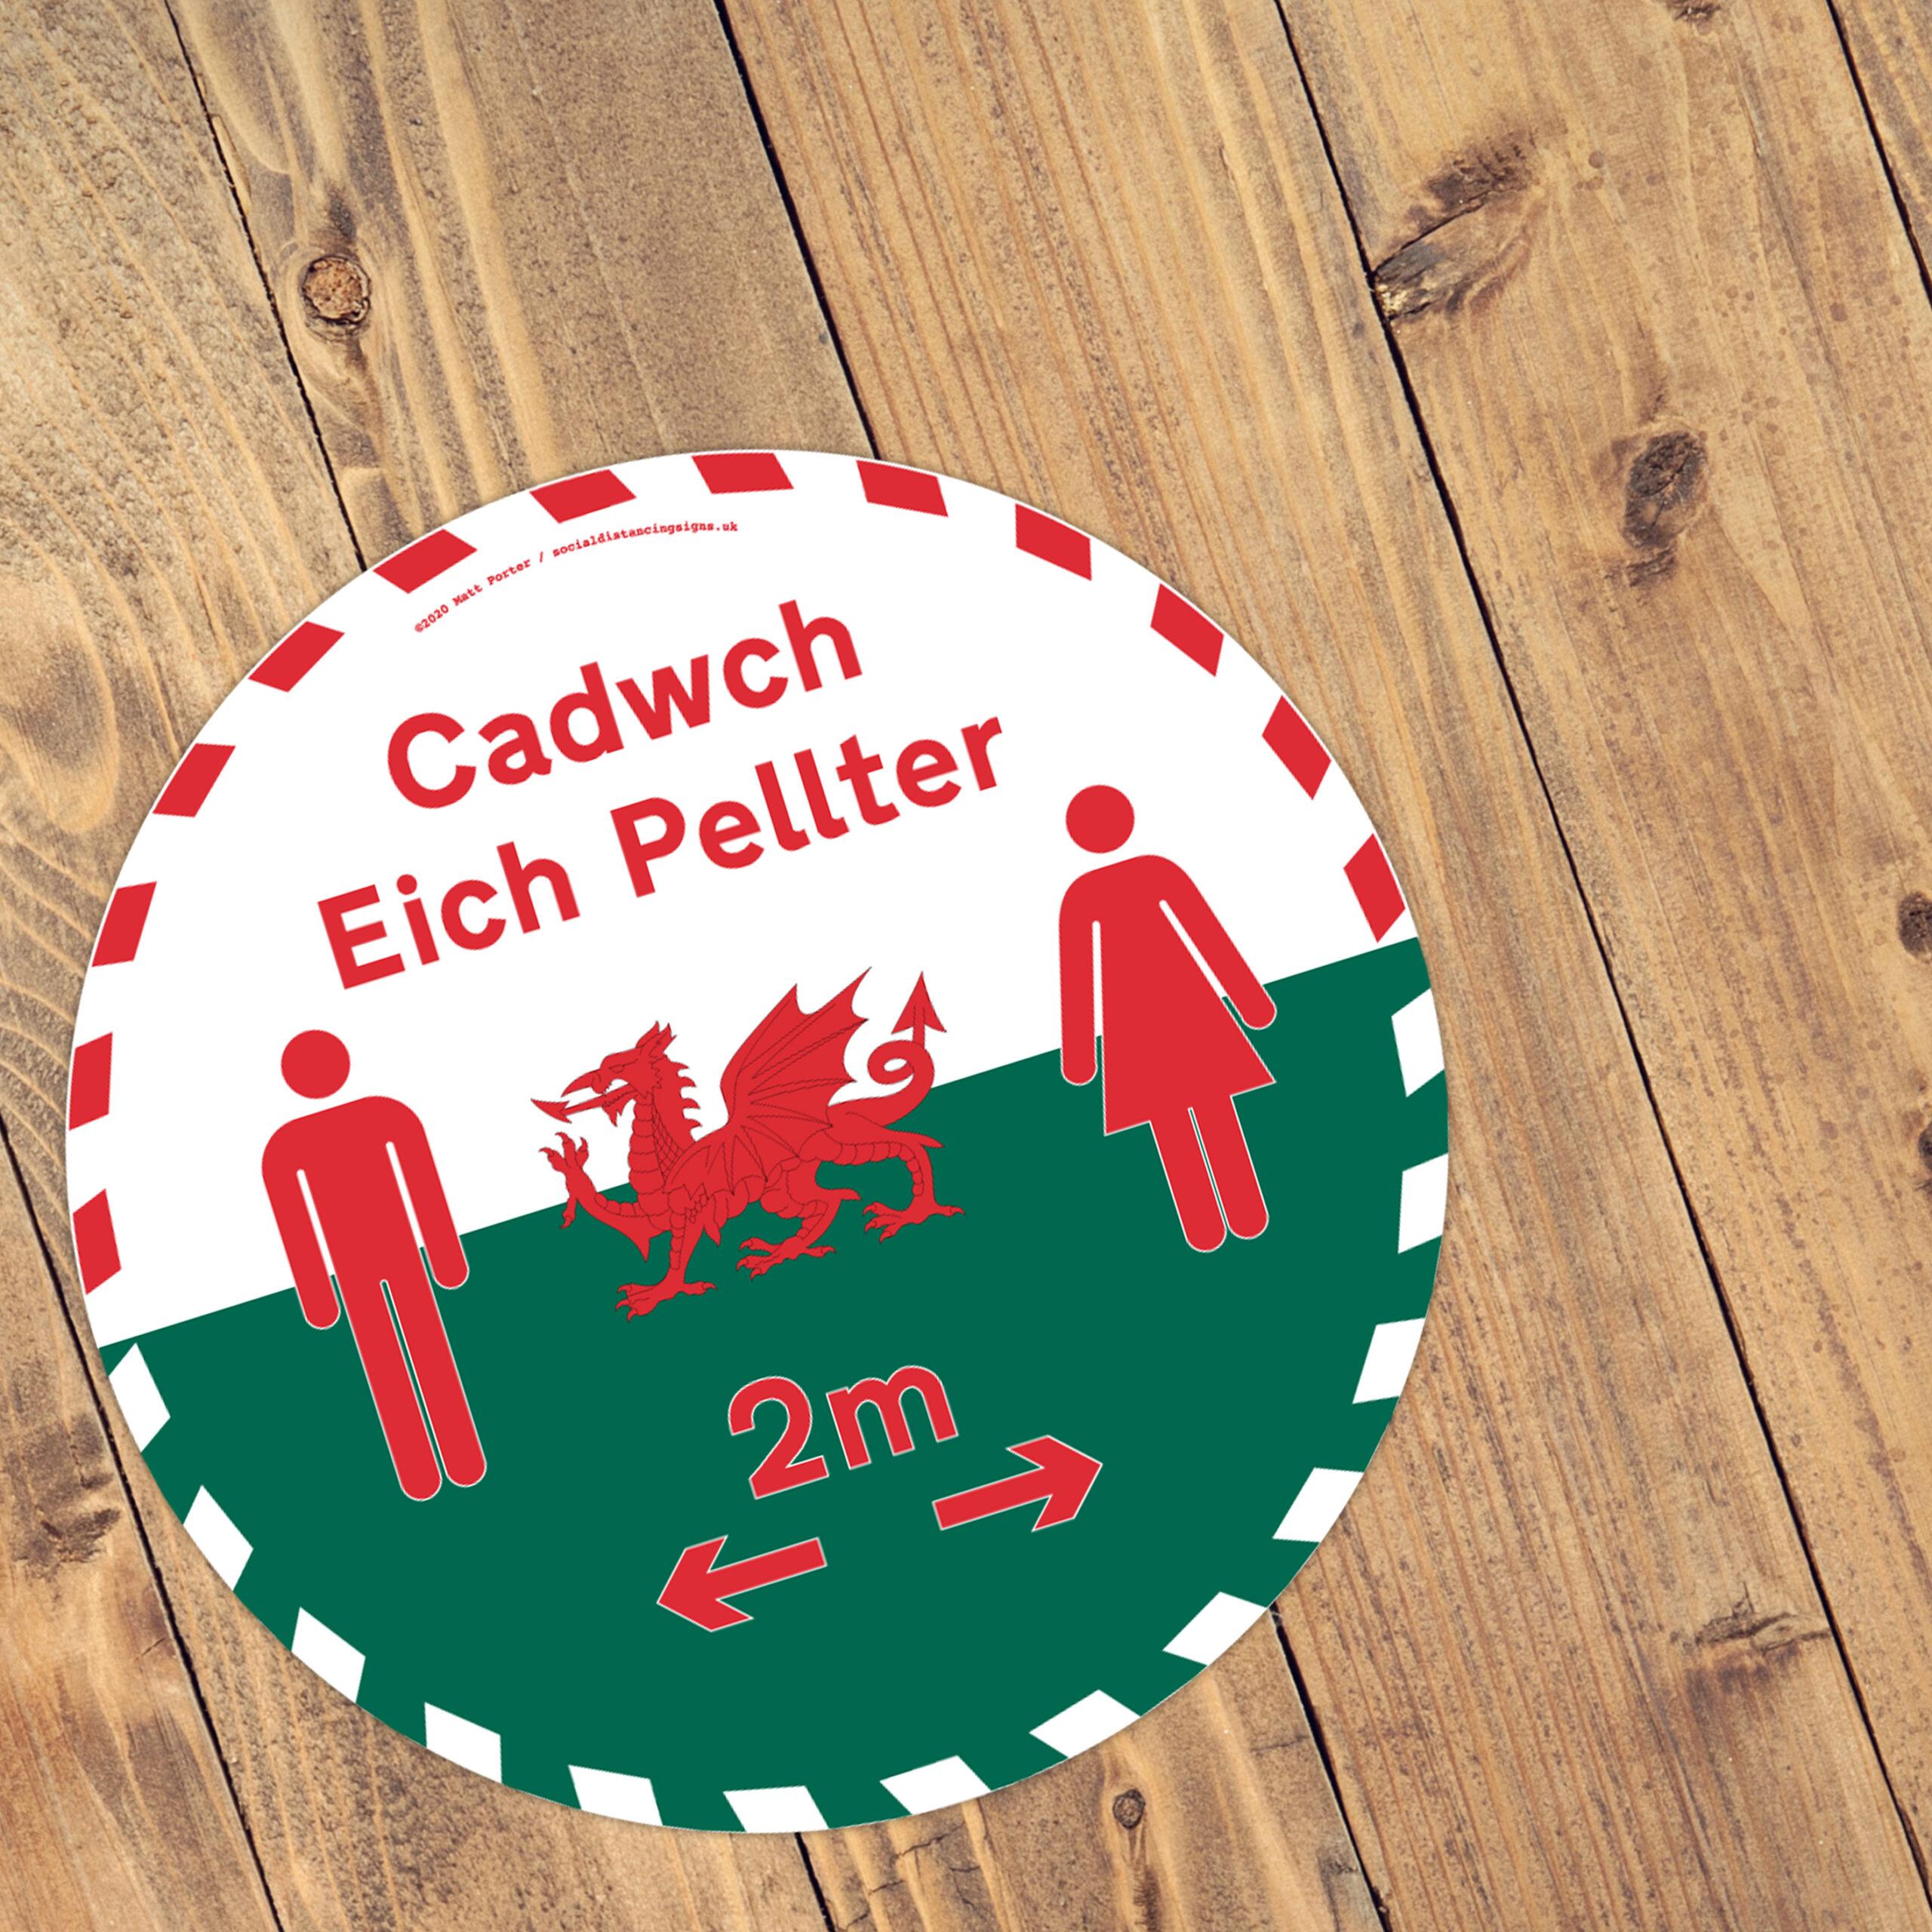 Cadwch Eich Pellter - Keep Your Distance  - Social Distancing Anti-Slip Floor Stickers (300mm) - Wales / Cymru